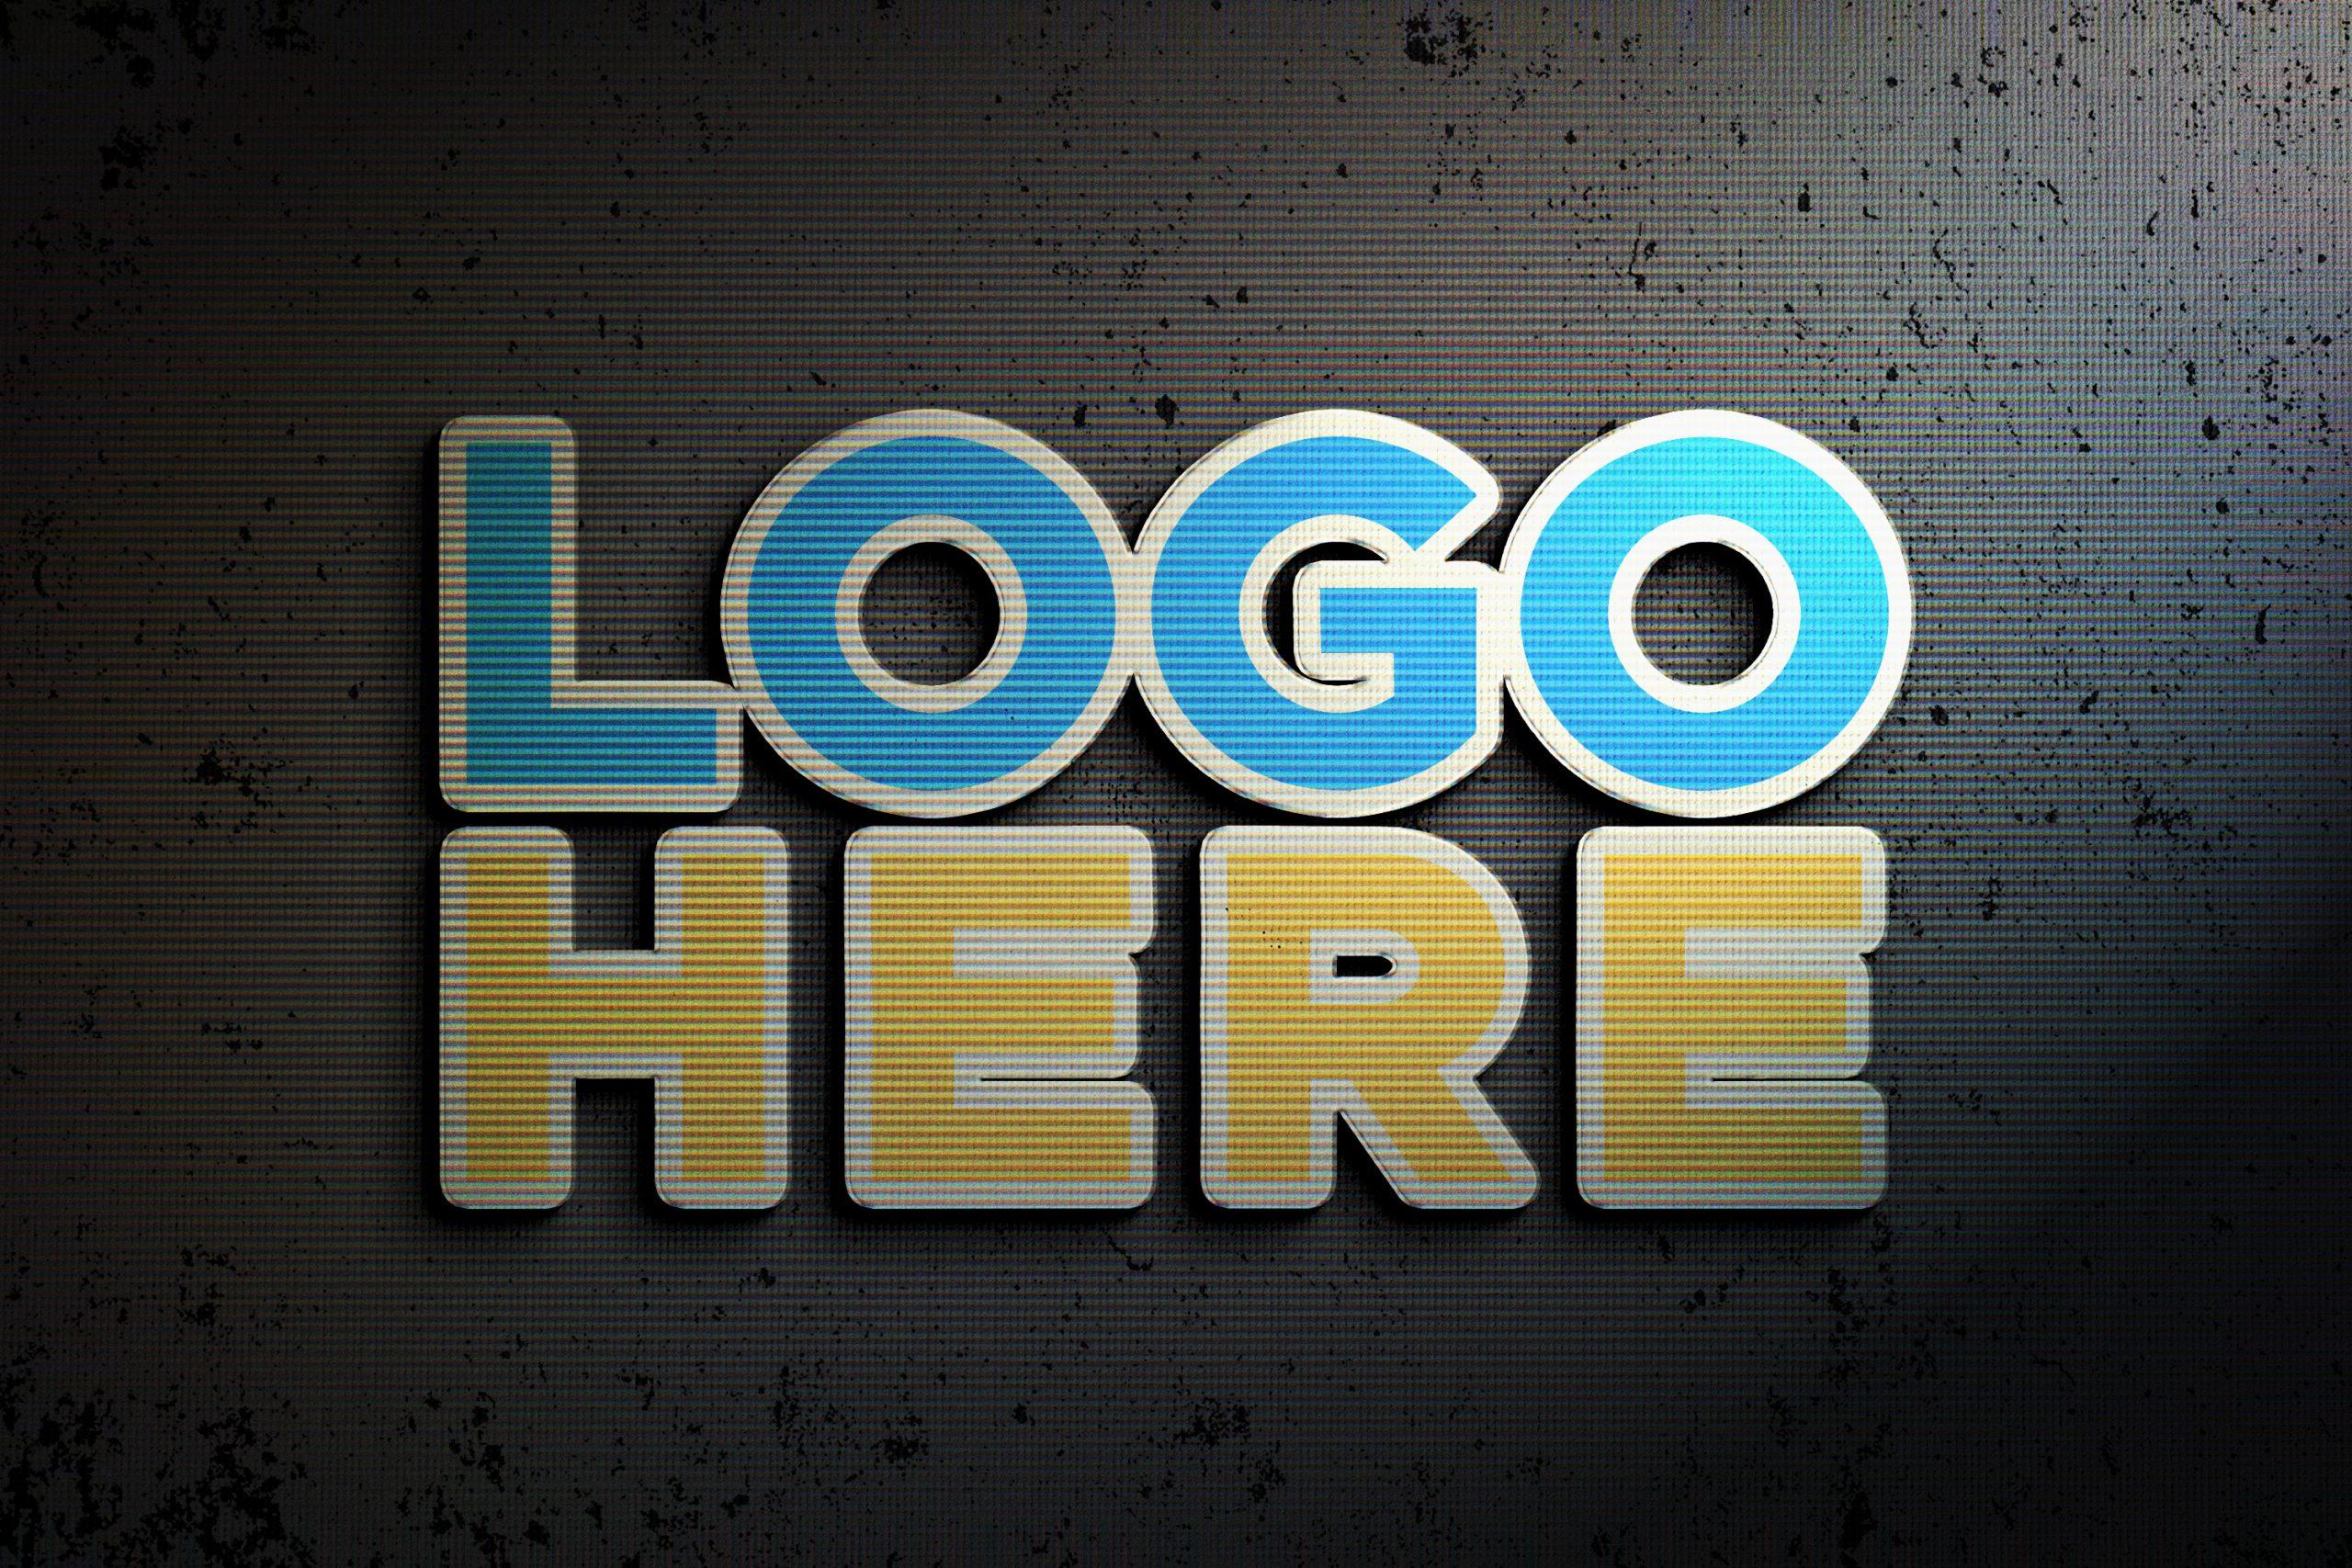 Logo-Here-Photoshop-Logo-Mock-up-with-Retro-Effects